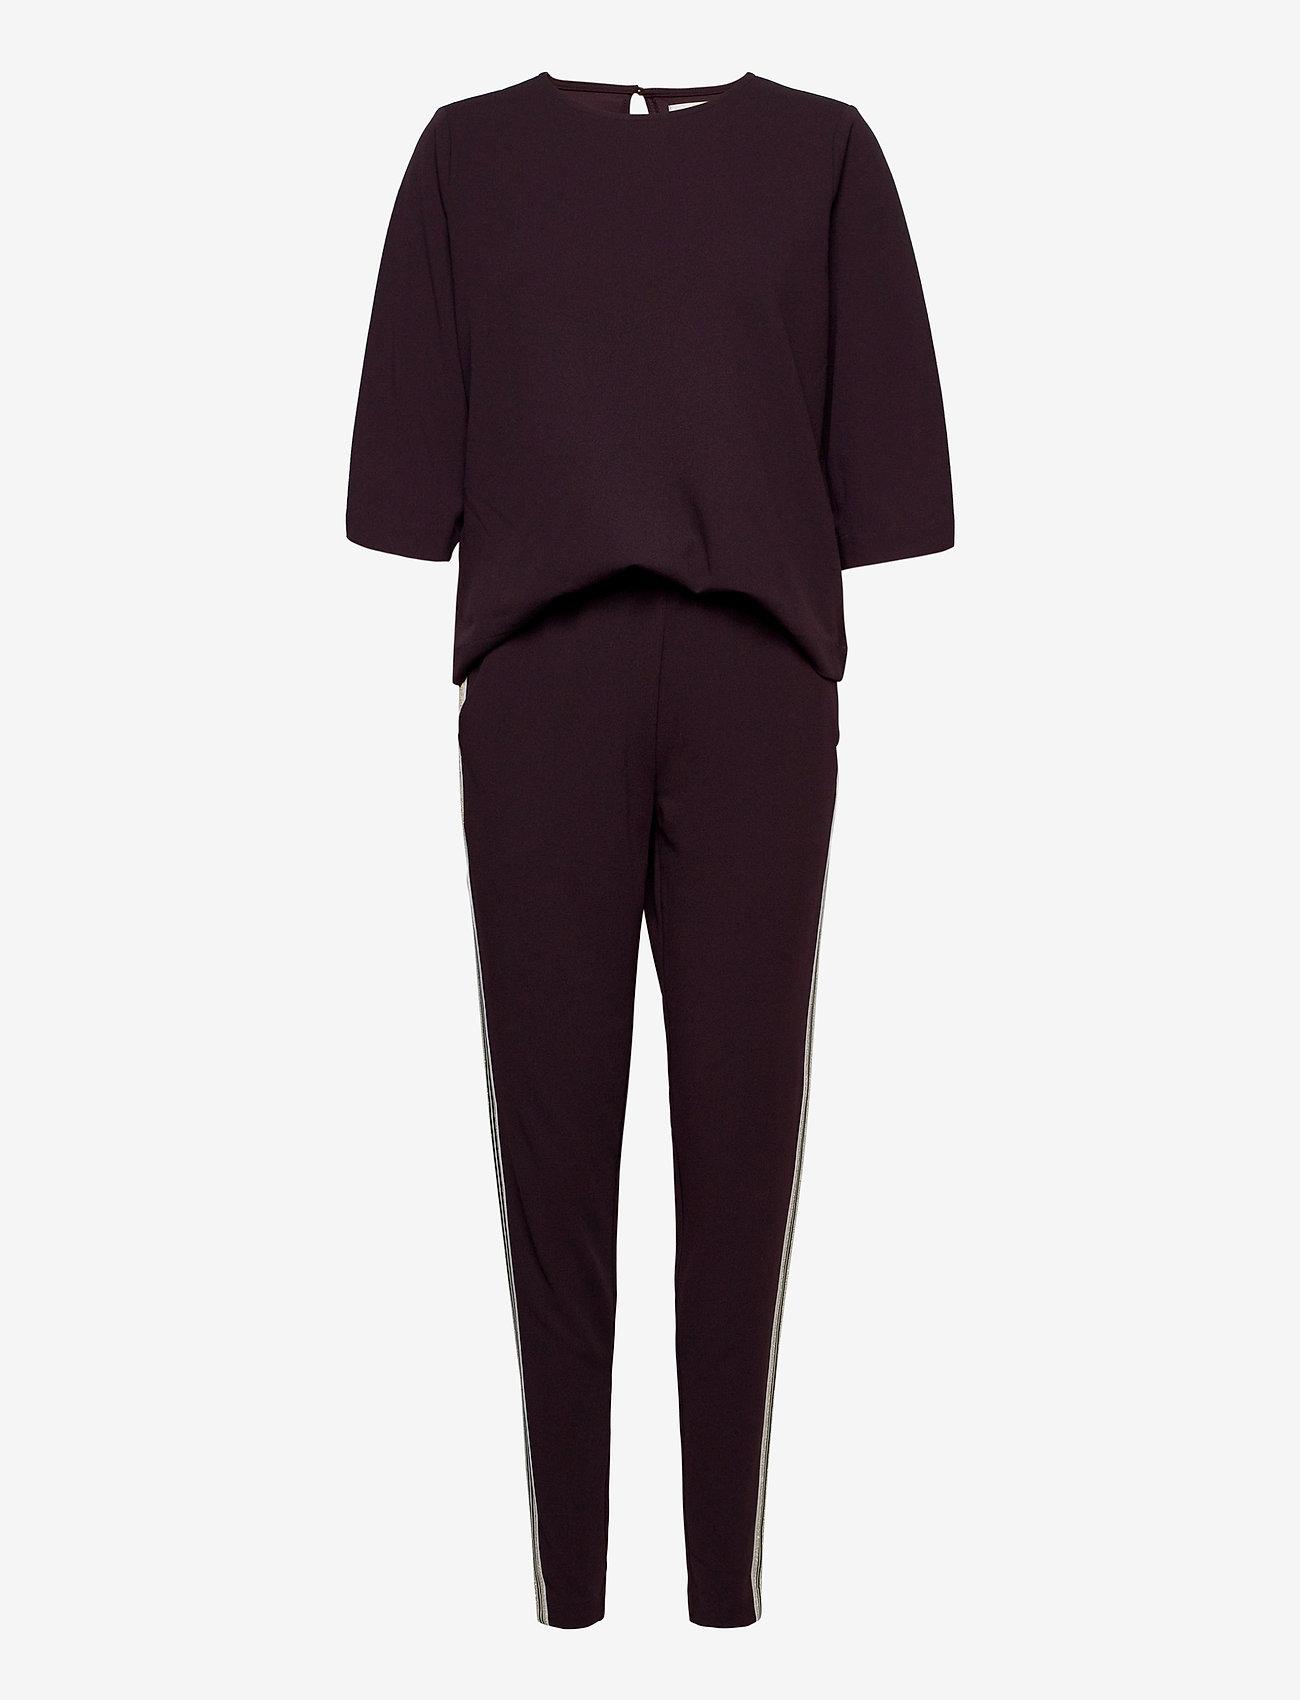 Soyaconcept - SC-MASCHA - clothing - maroon - 0